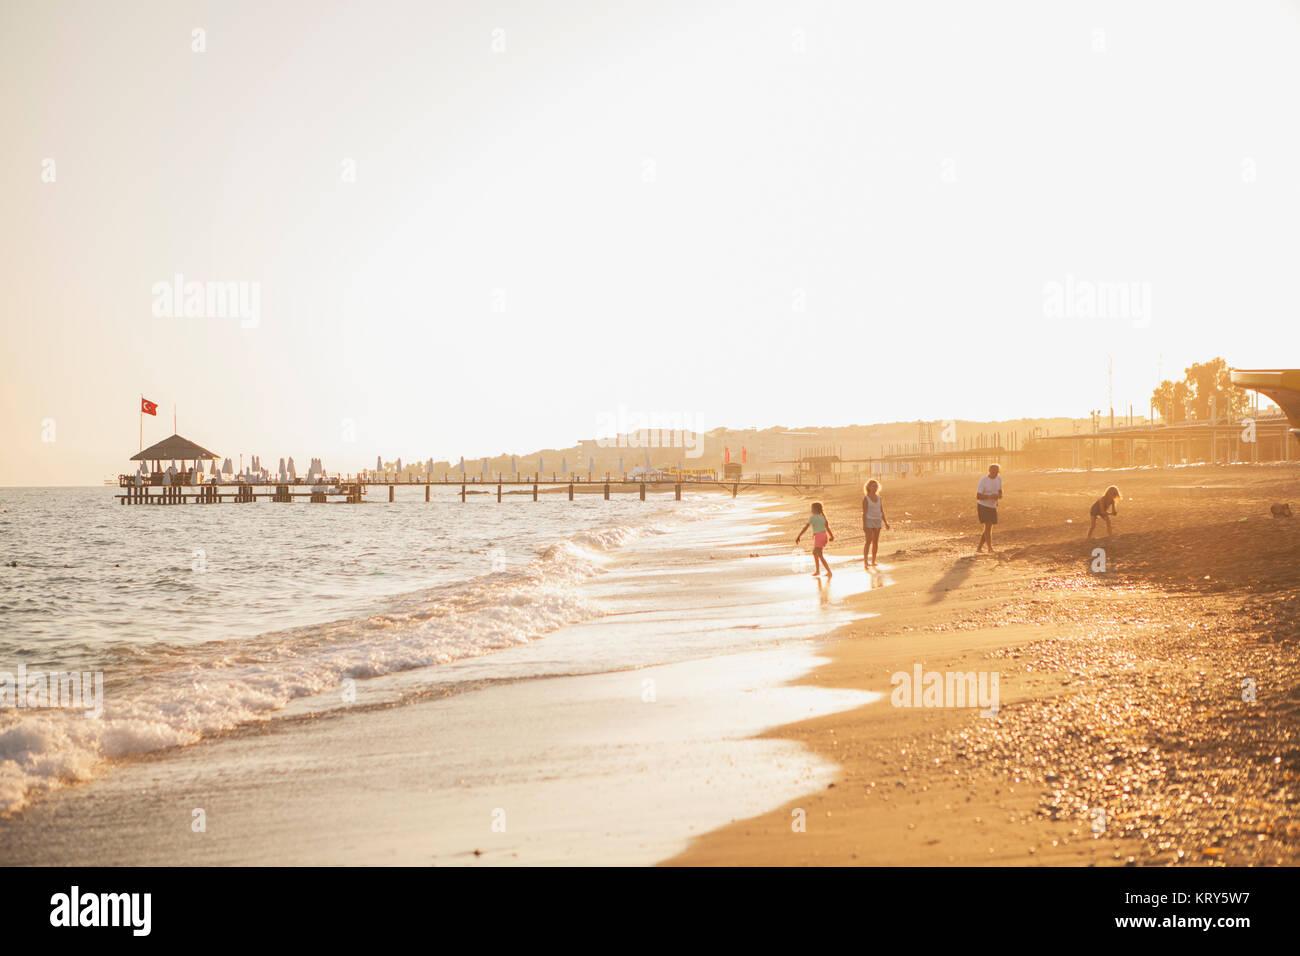 A beach in Turkey - Stock Image